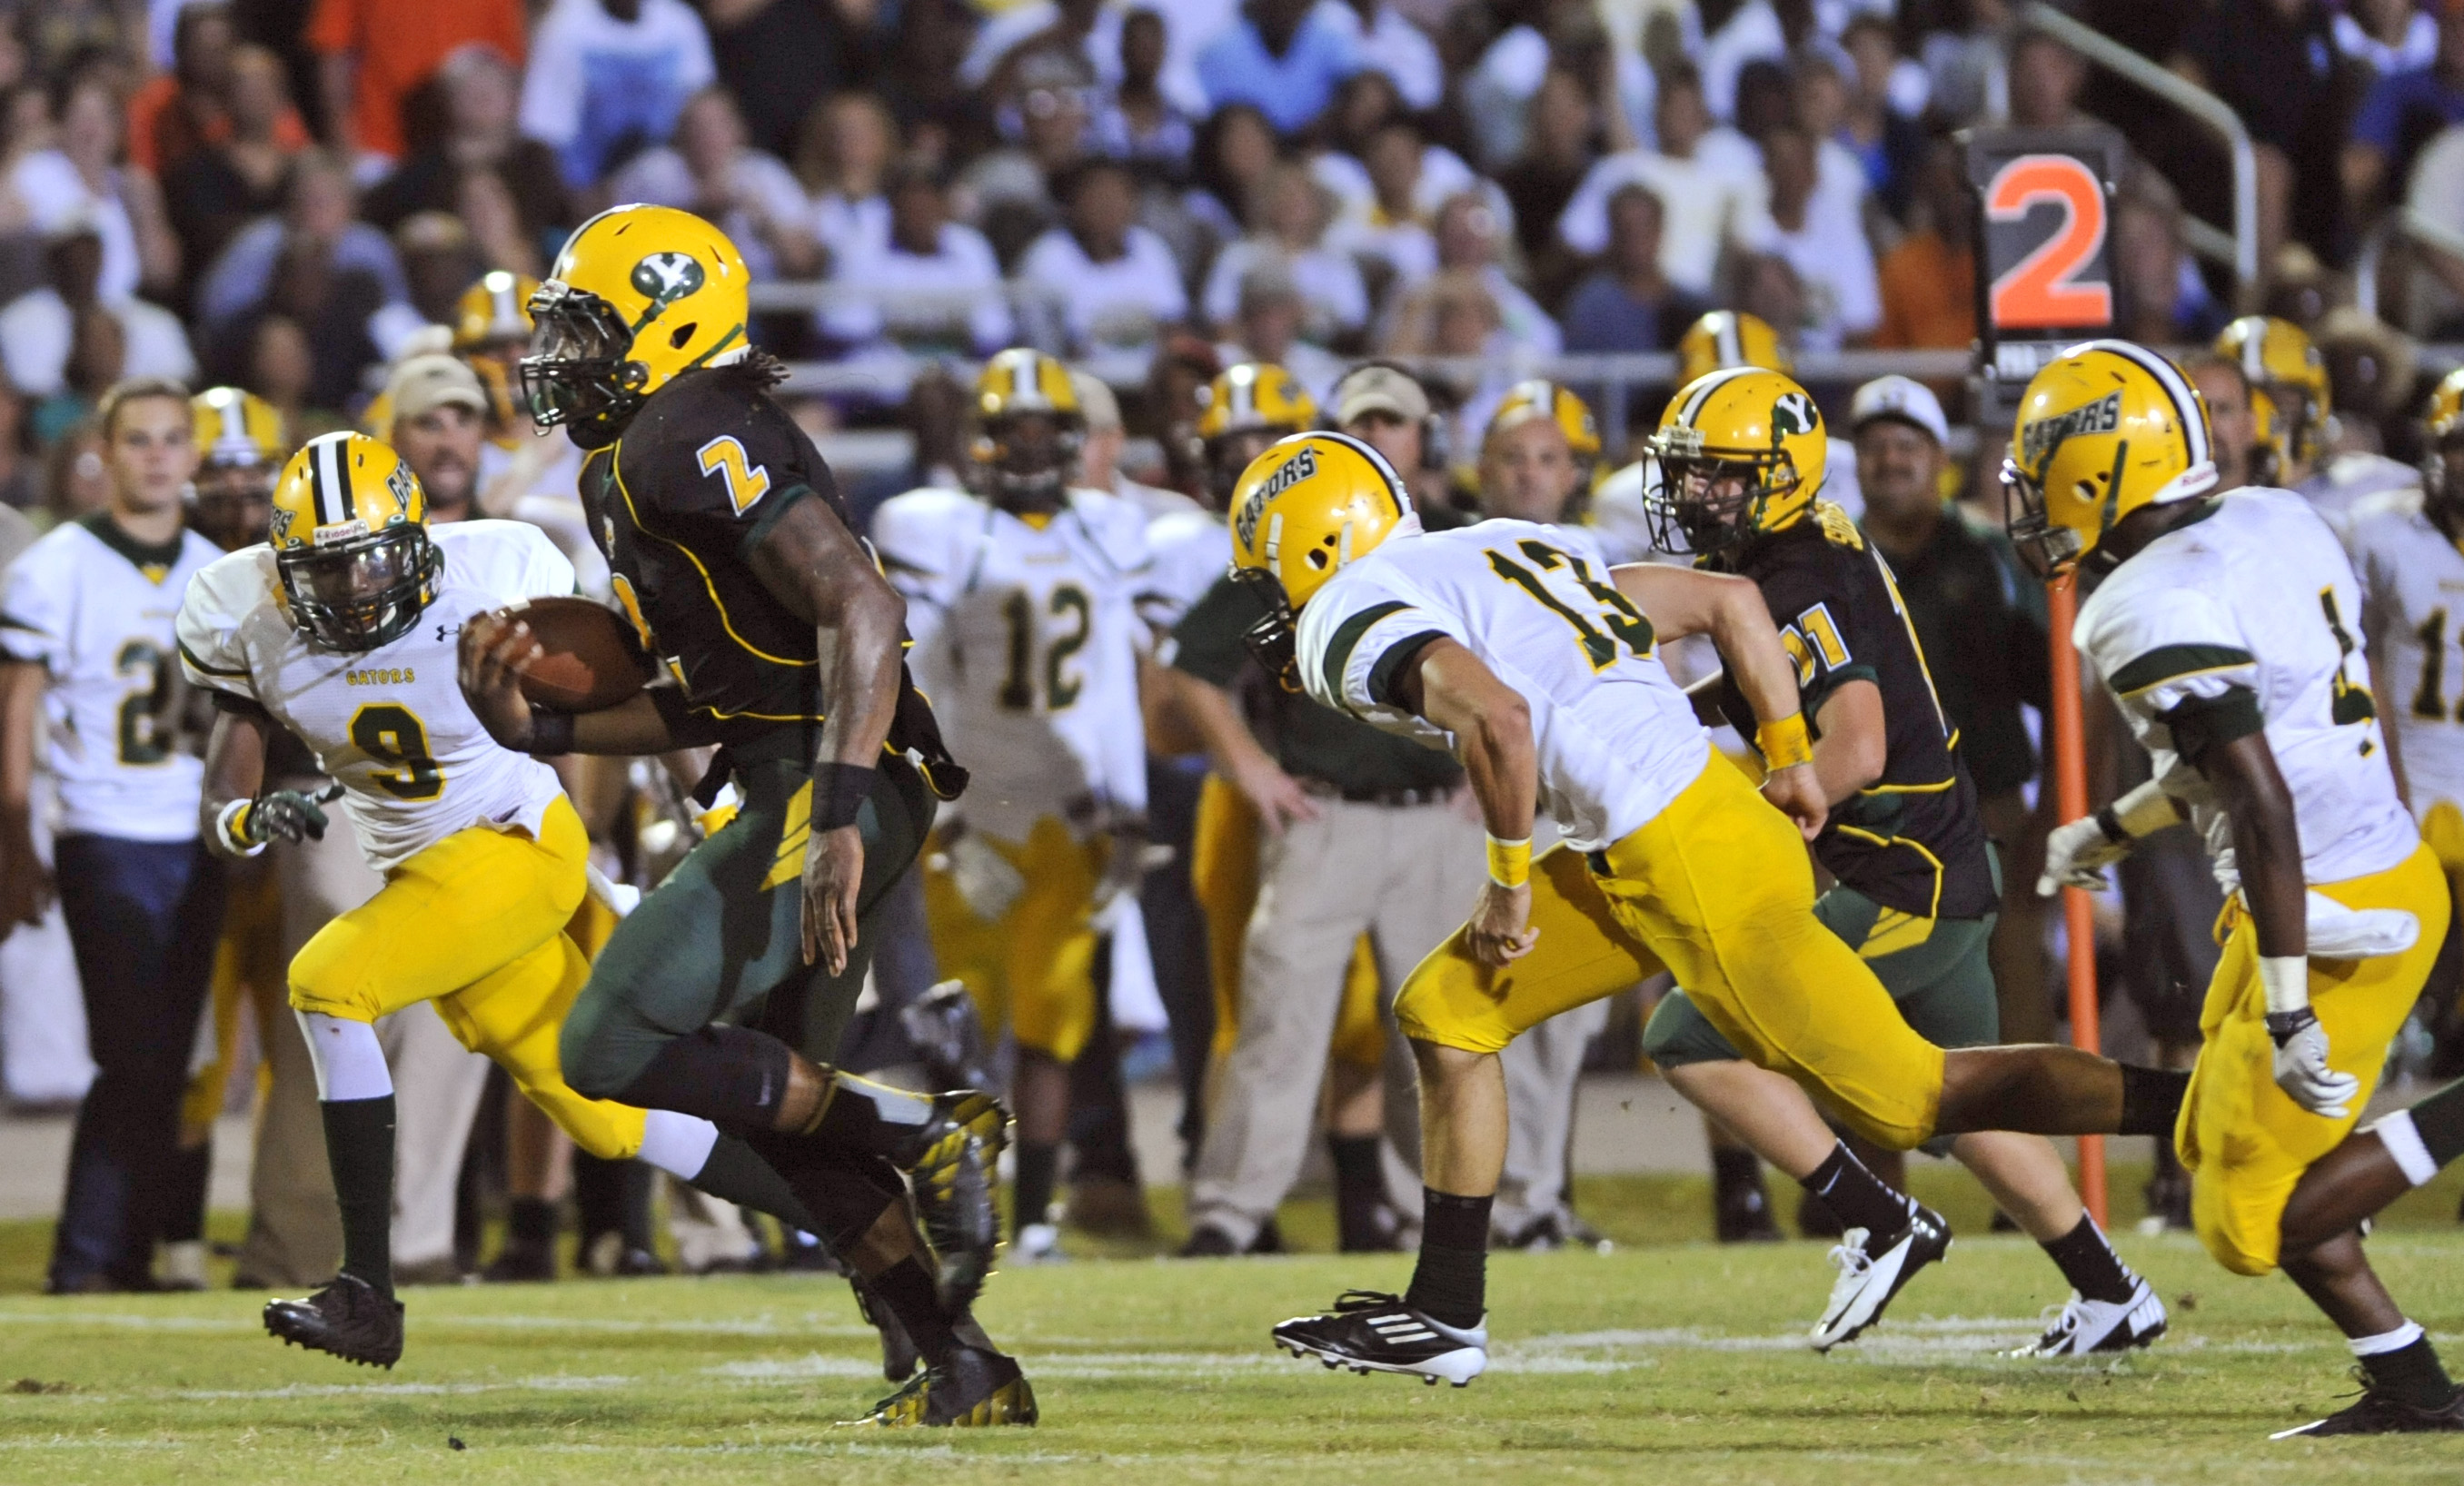 Yulee running back Derrick Henry (2). (Photo: Will Dickey, AP)